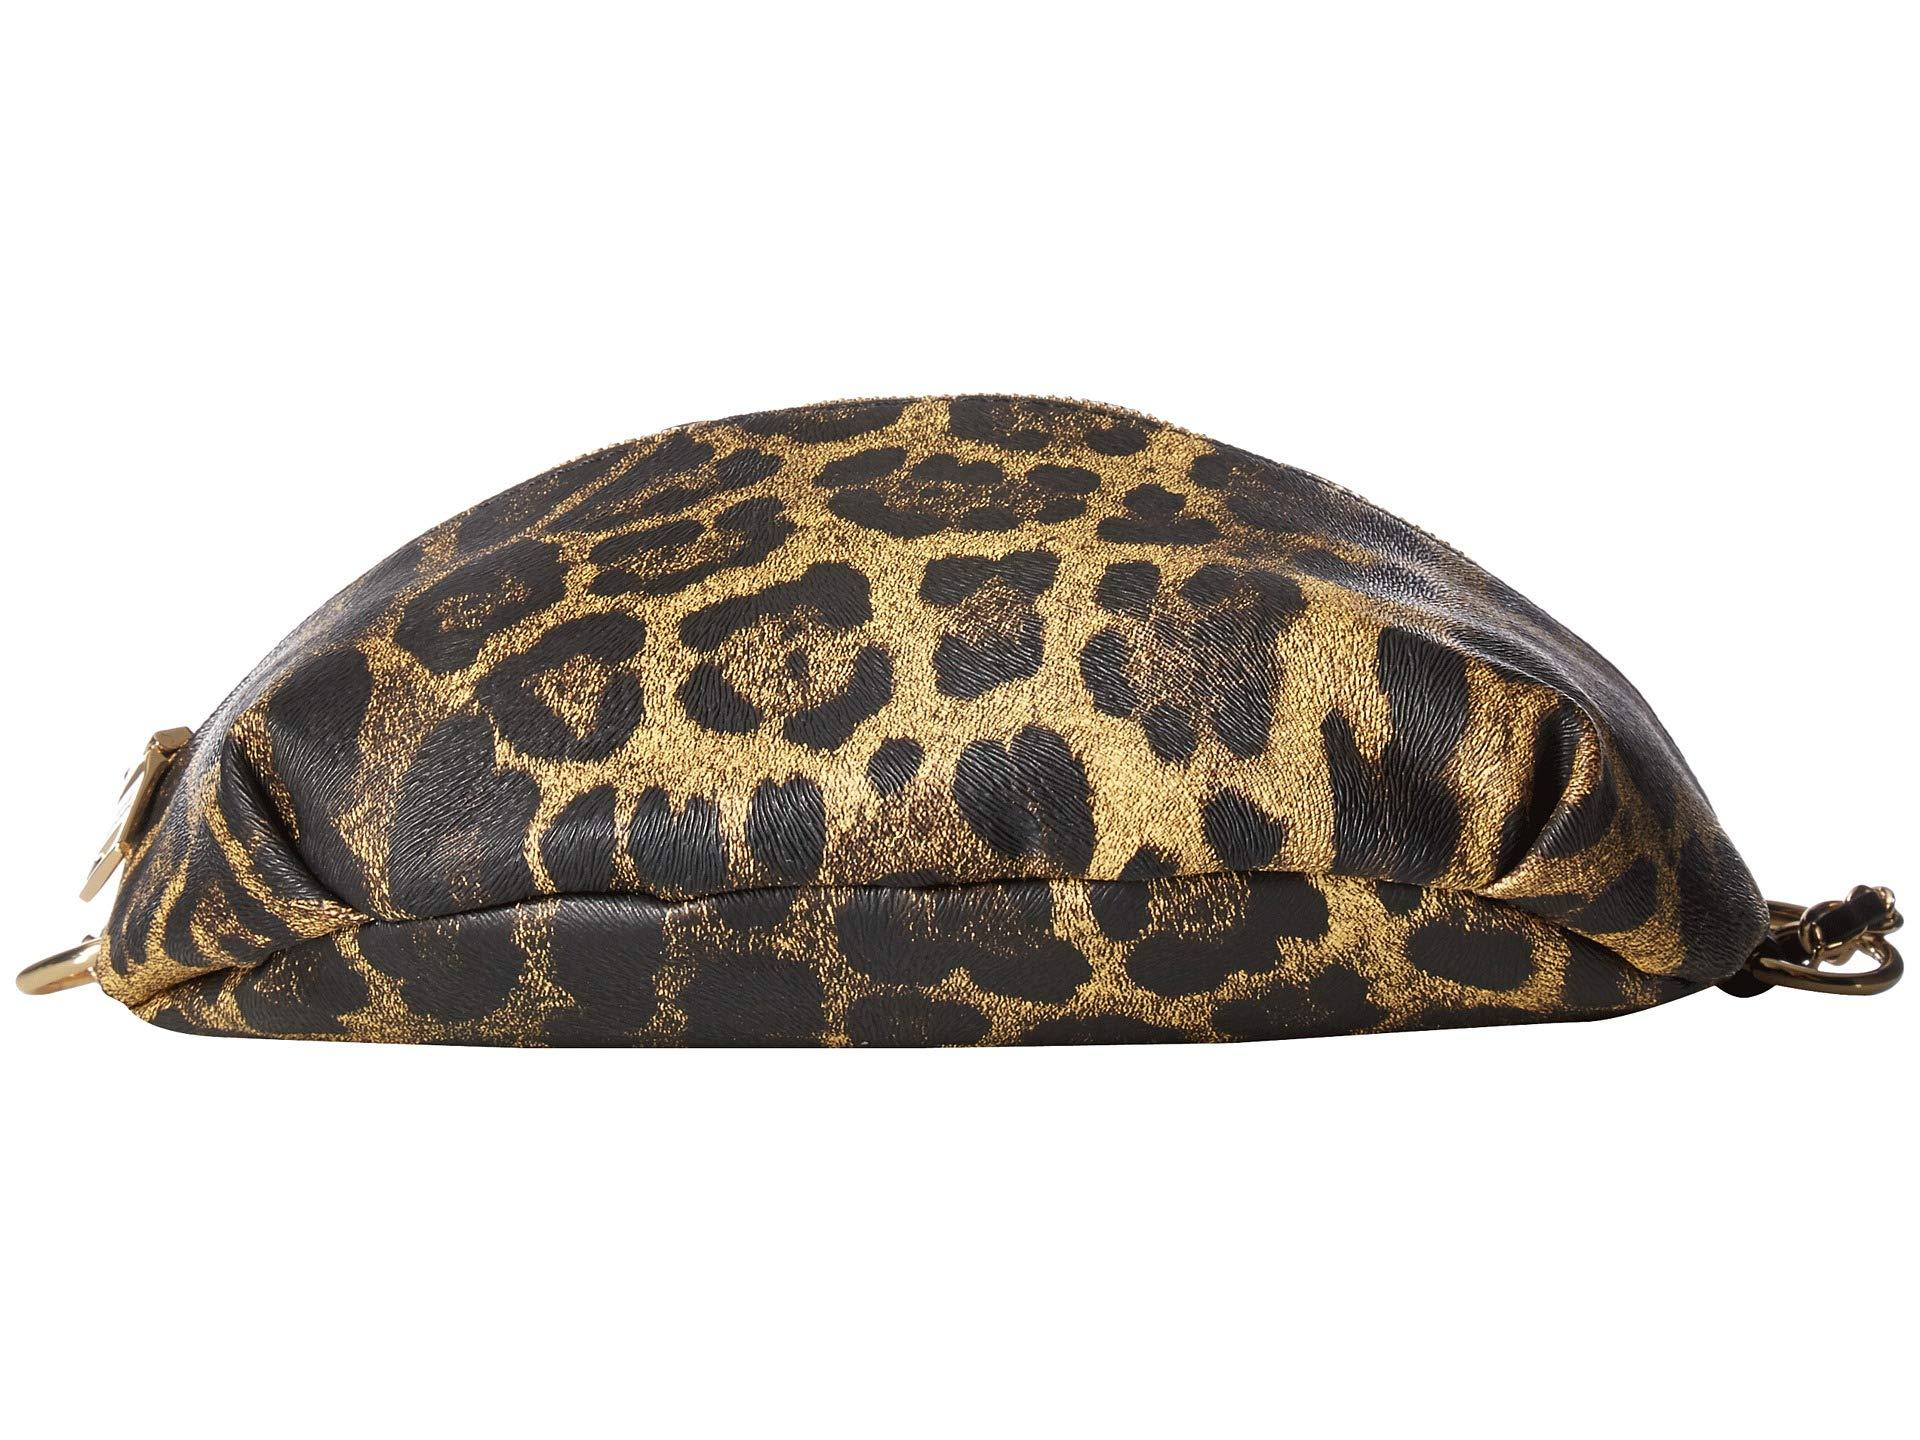 Leopard Bmacy Madden Steve Madden Steve aqqIS